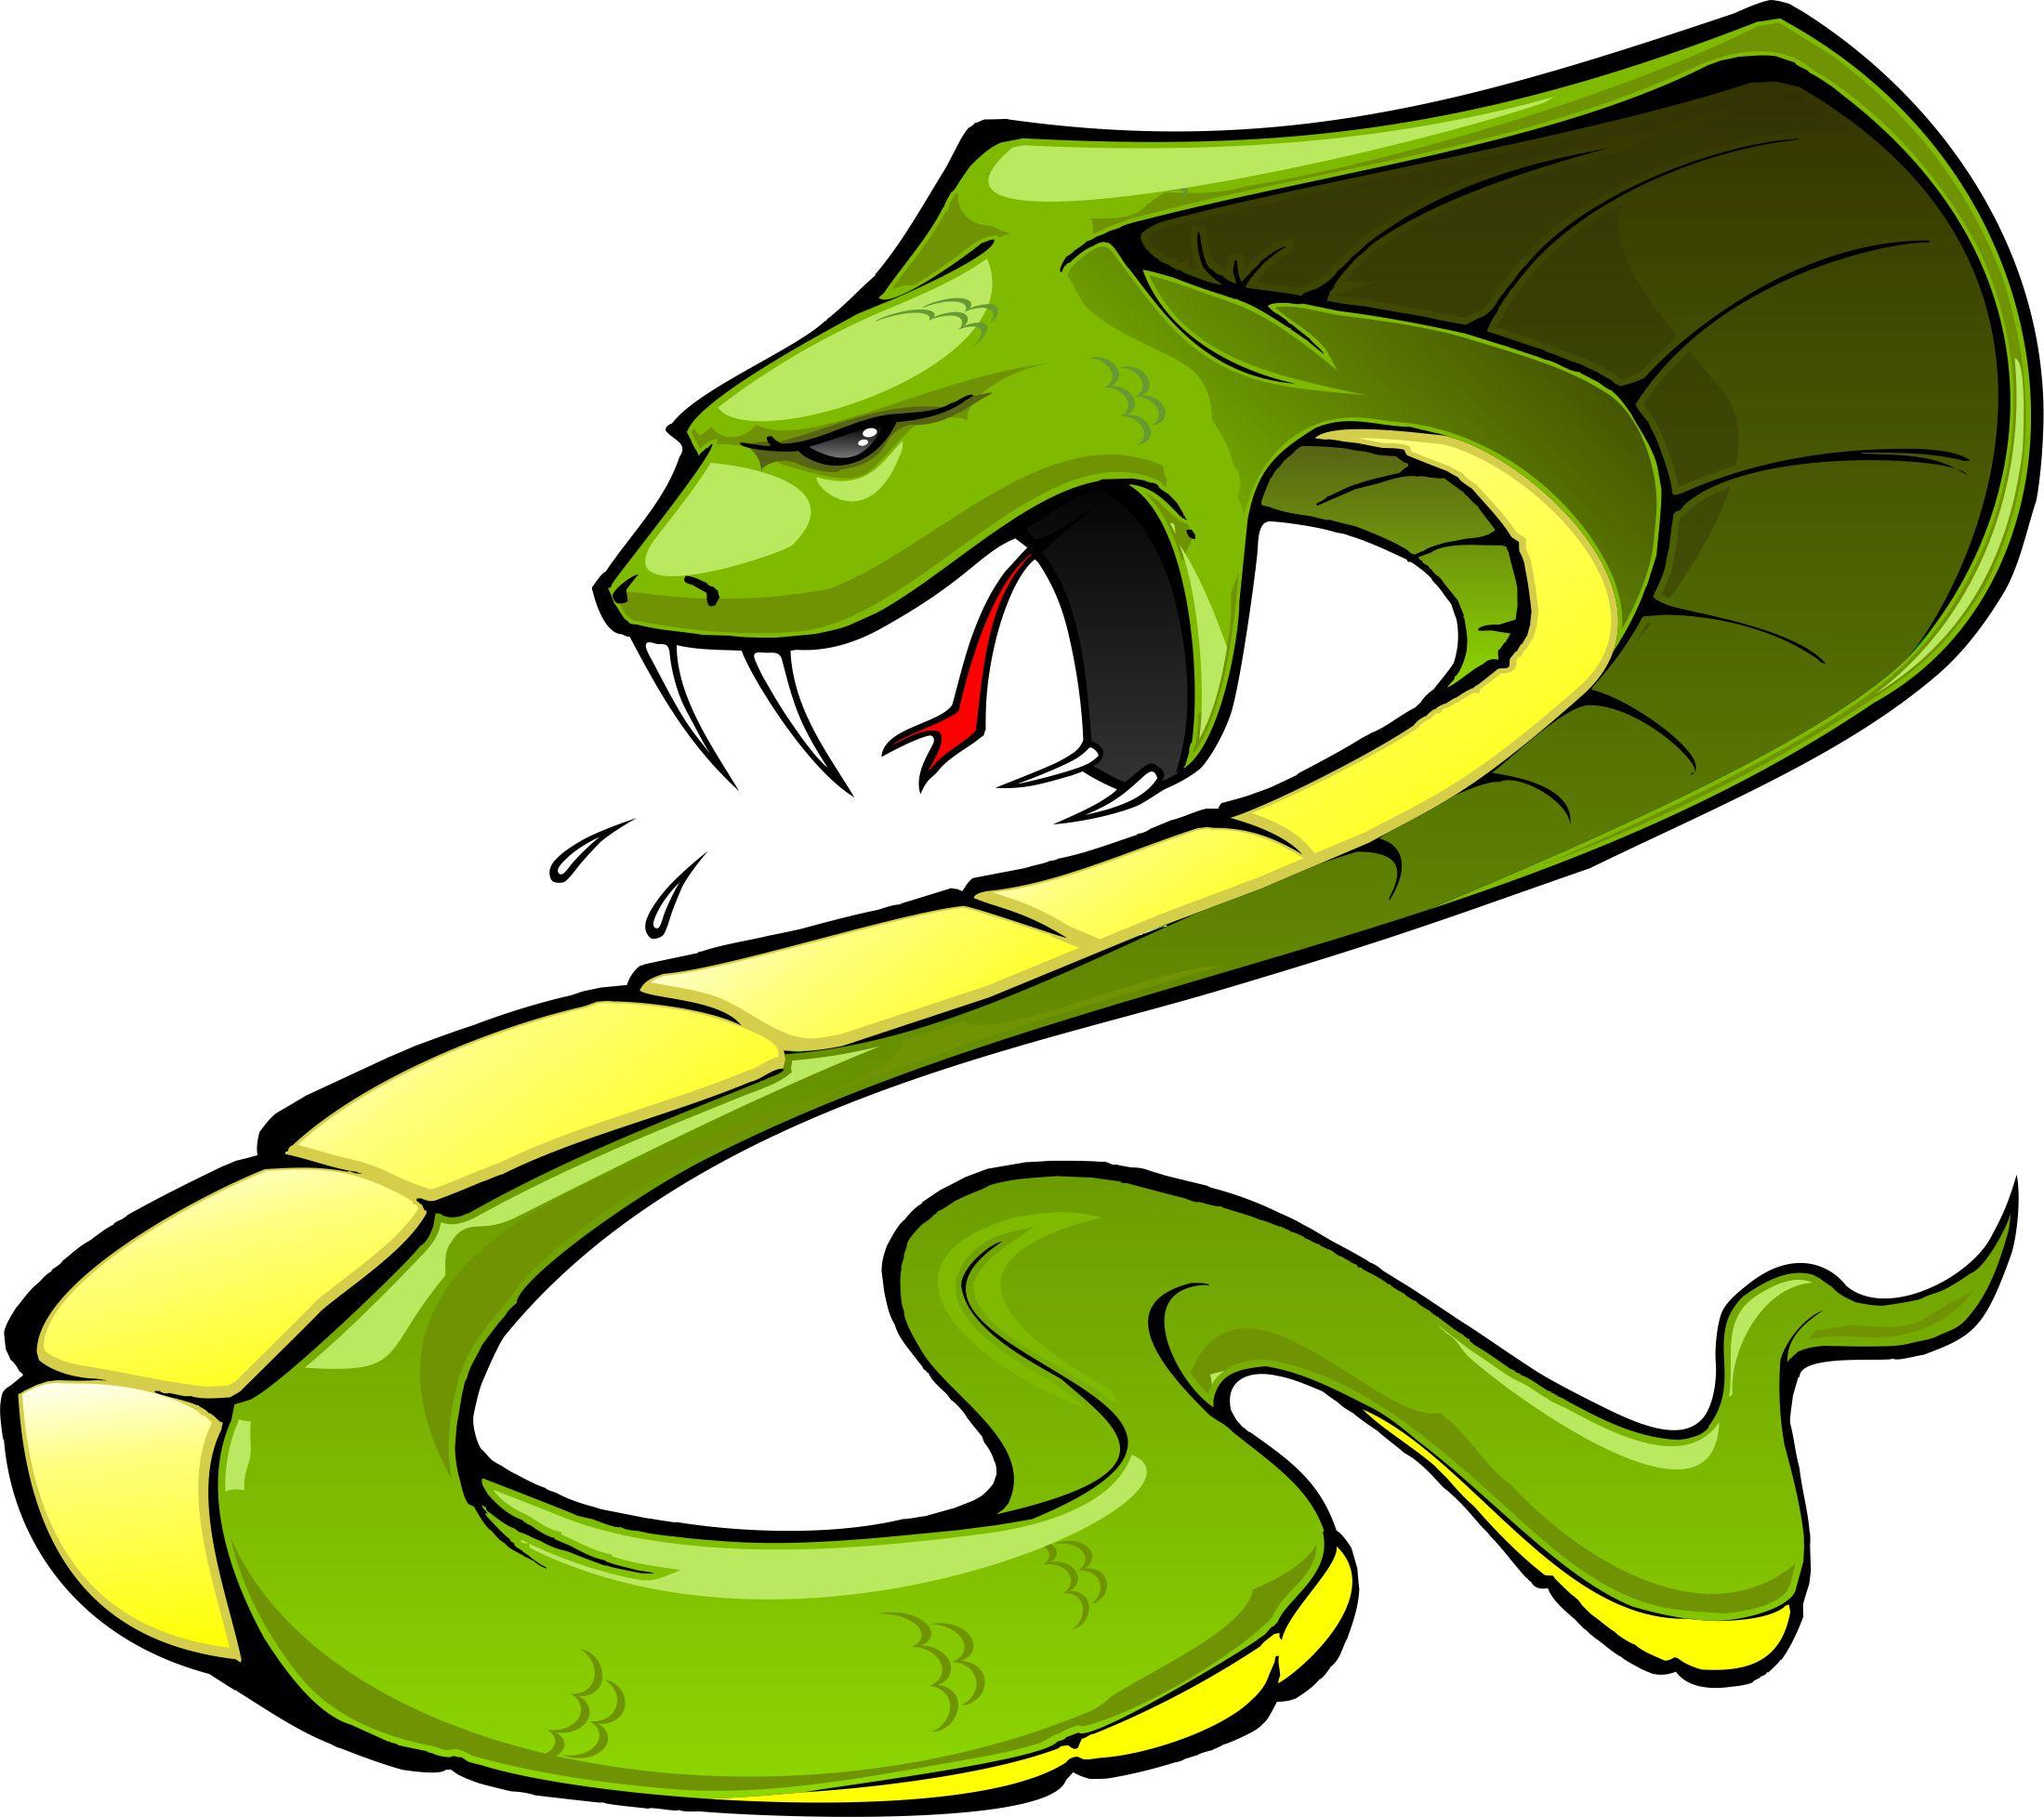 Viper Snake Logo Images .